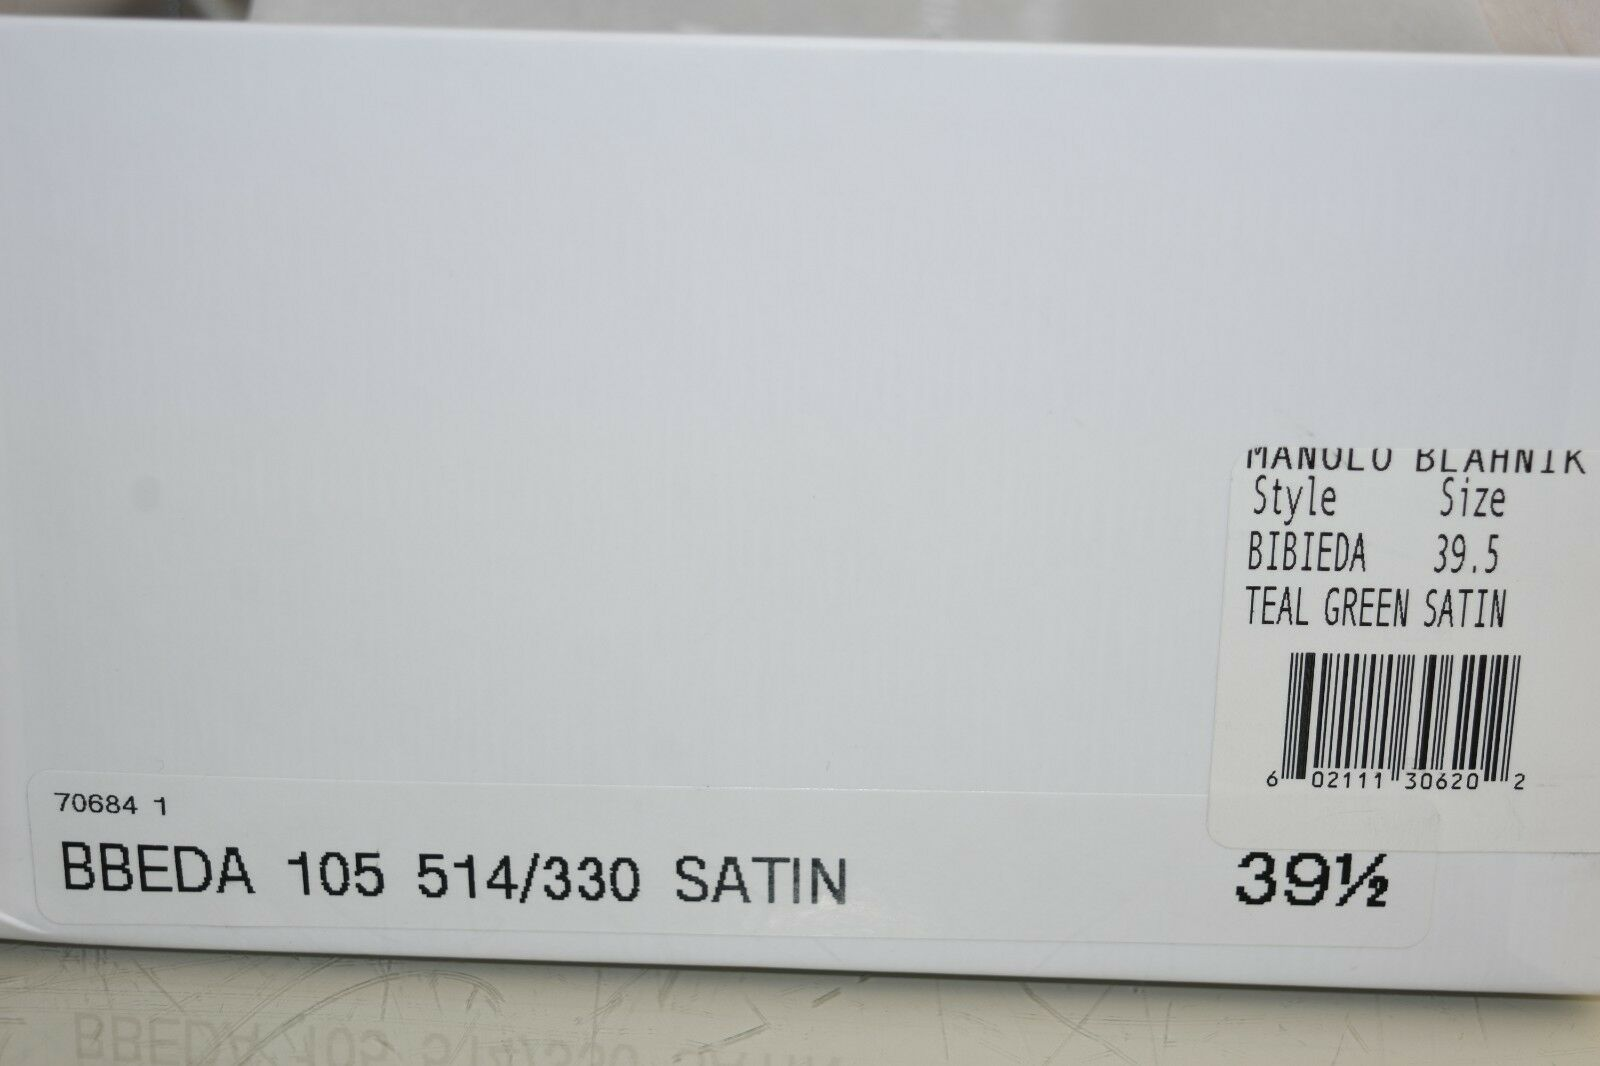 $840 NEW Manolo Blahnik BIBIEDA 105 BB Pumps Satin 36.5 Teal schuhes 36.5 Satin 39.5 40.5 41 a2e750